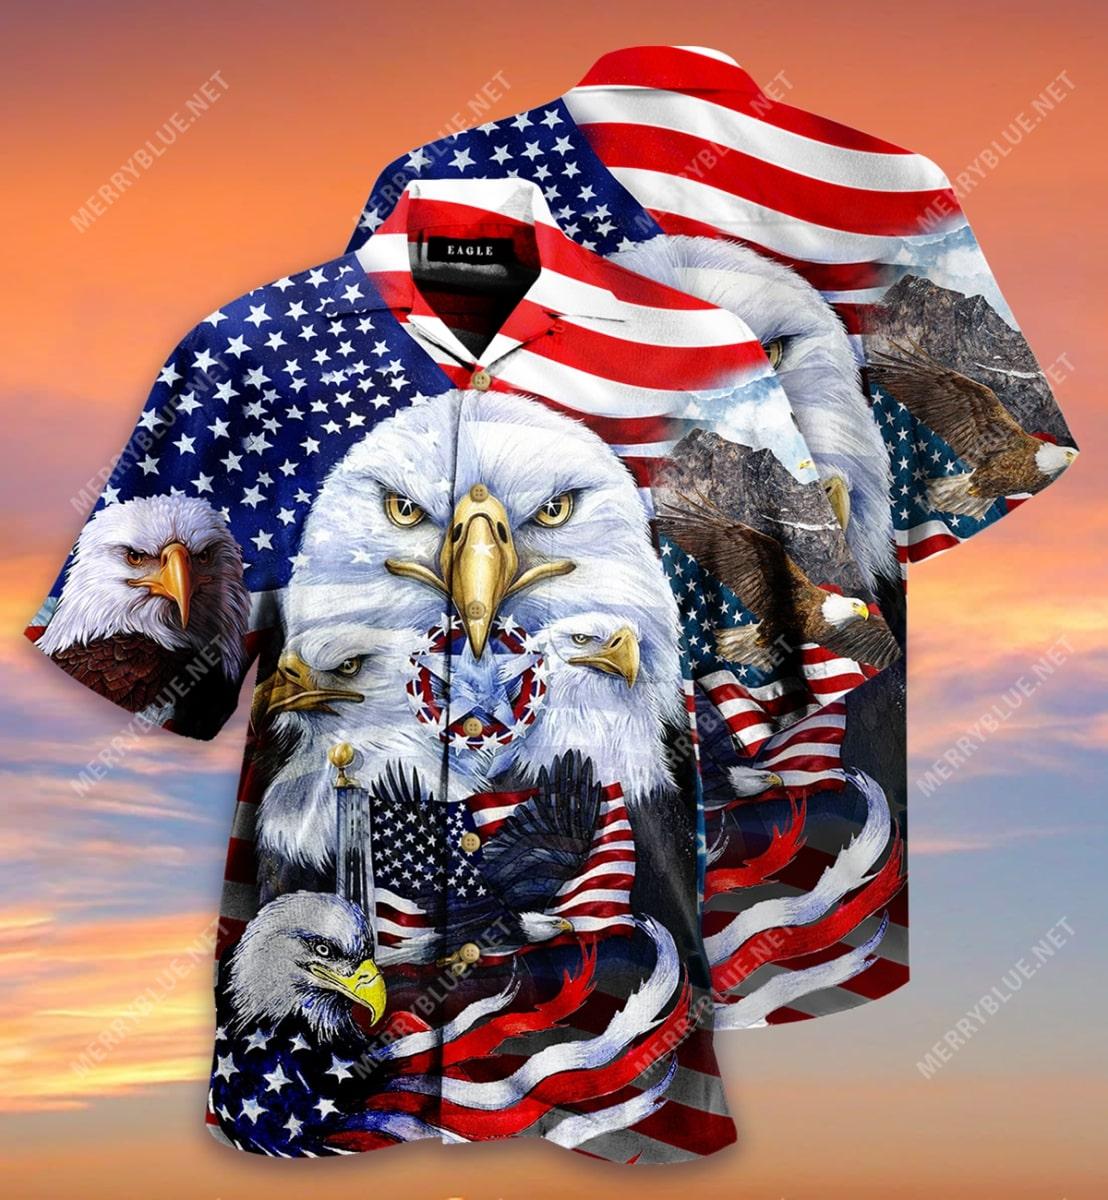 eagles patriotic american flag all over printed hawaiian shirt 3